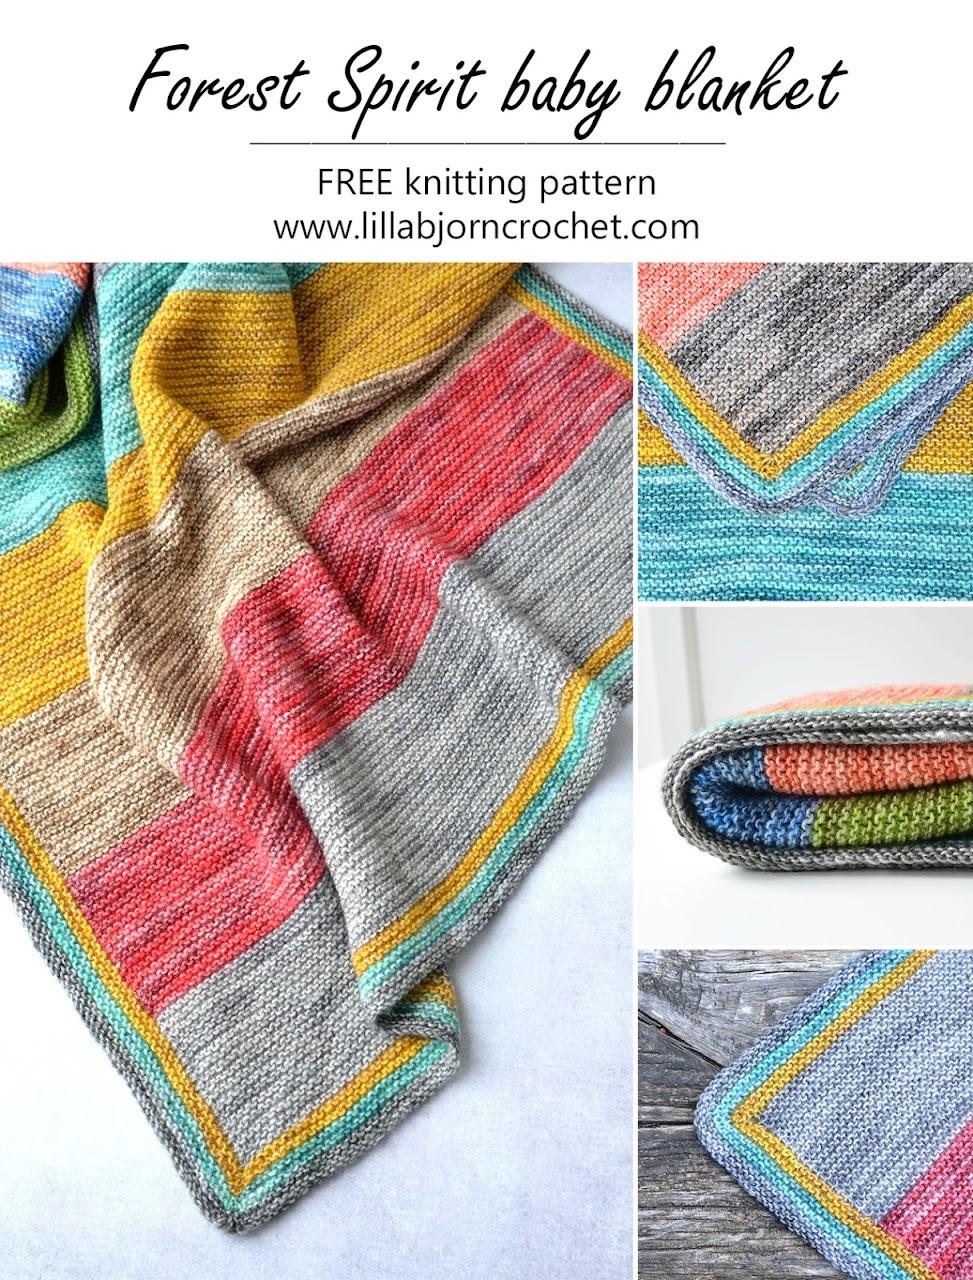 Forest Spirit baby blanket_FREE crochet pattern_www.lillabjorncrochet.com